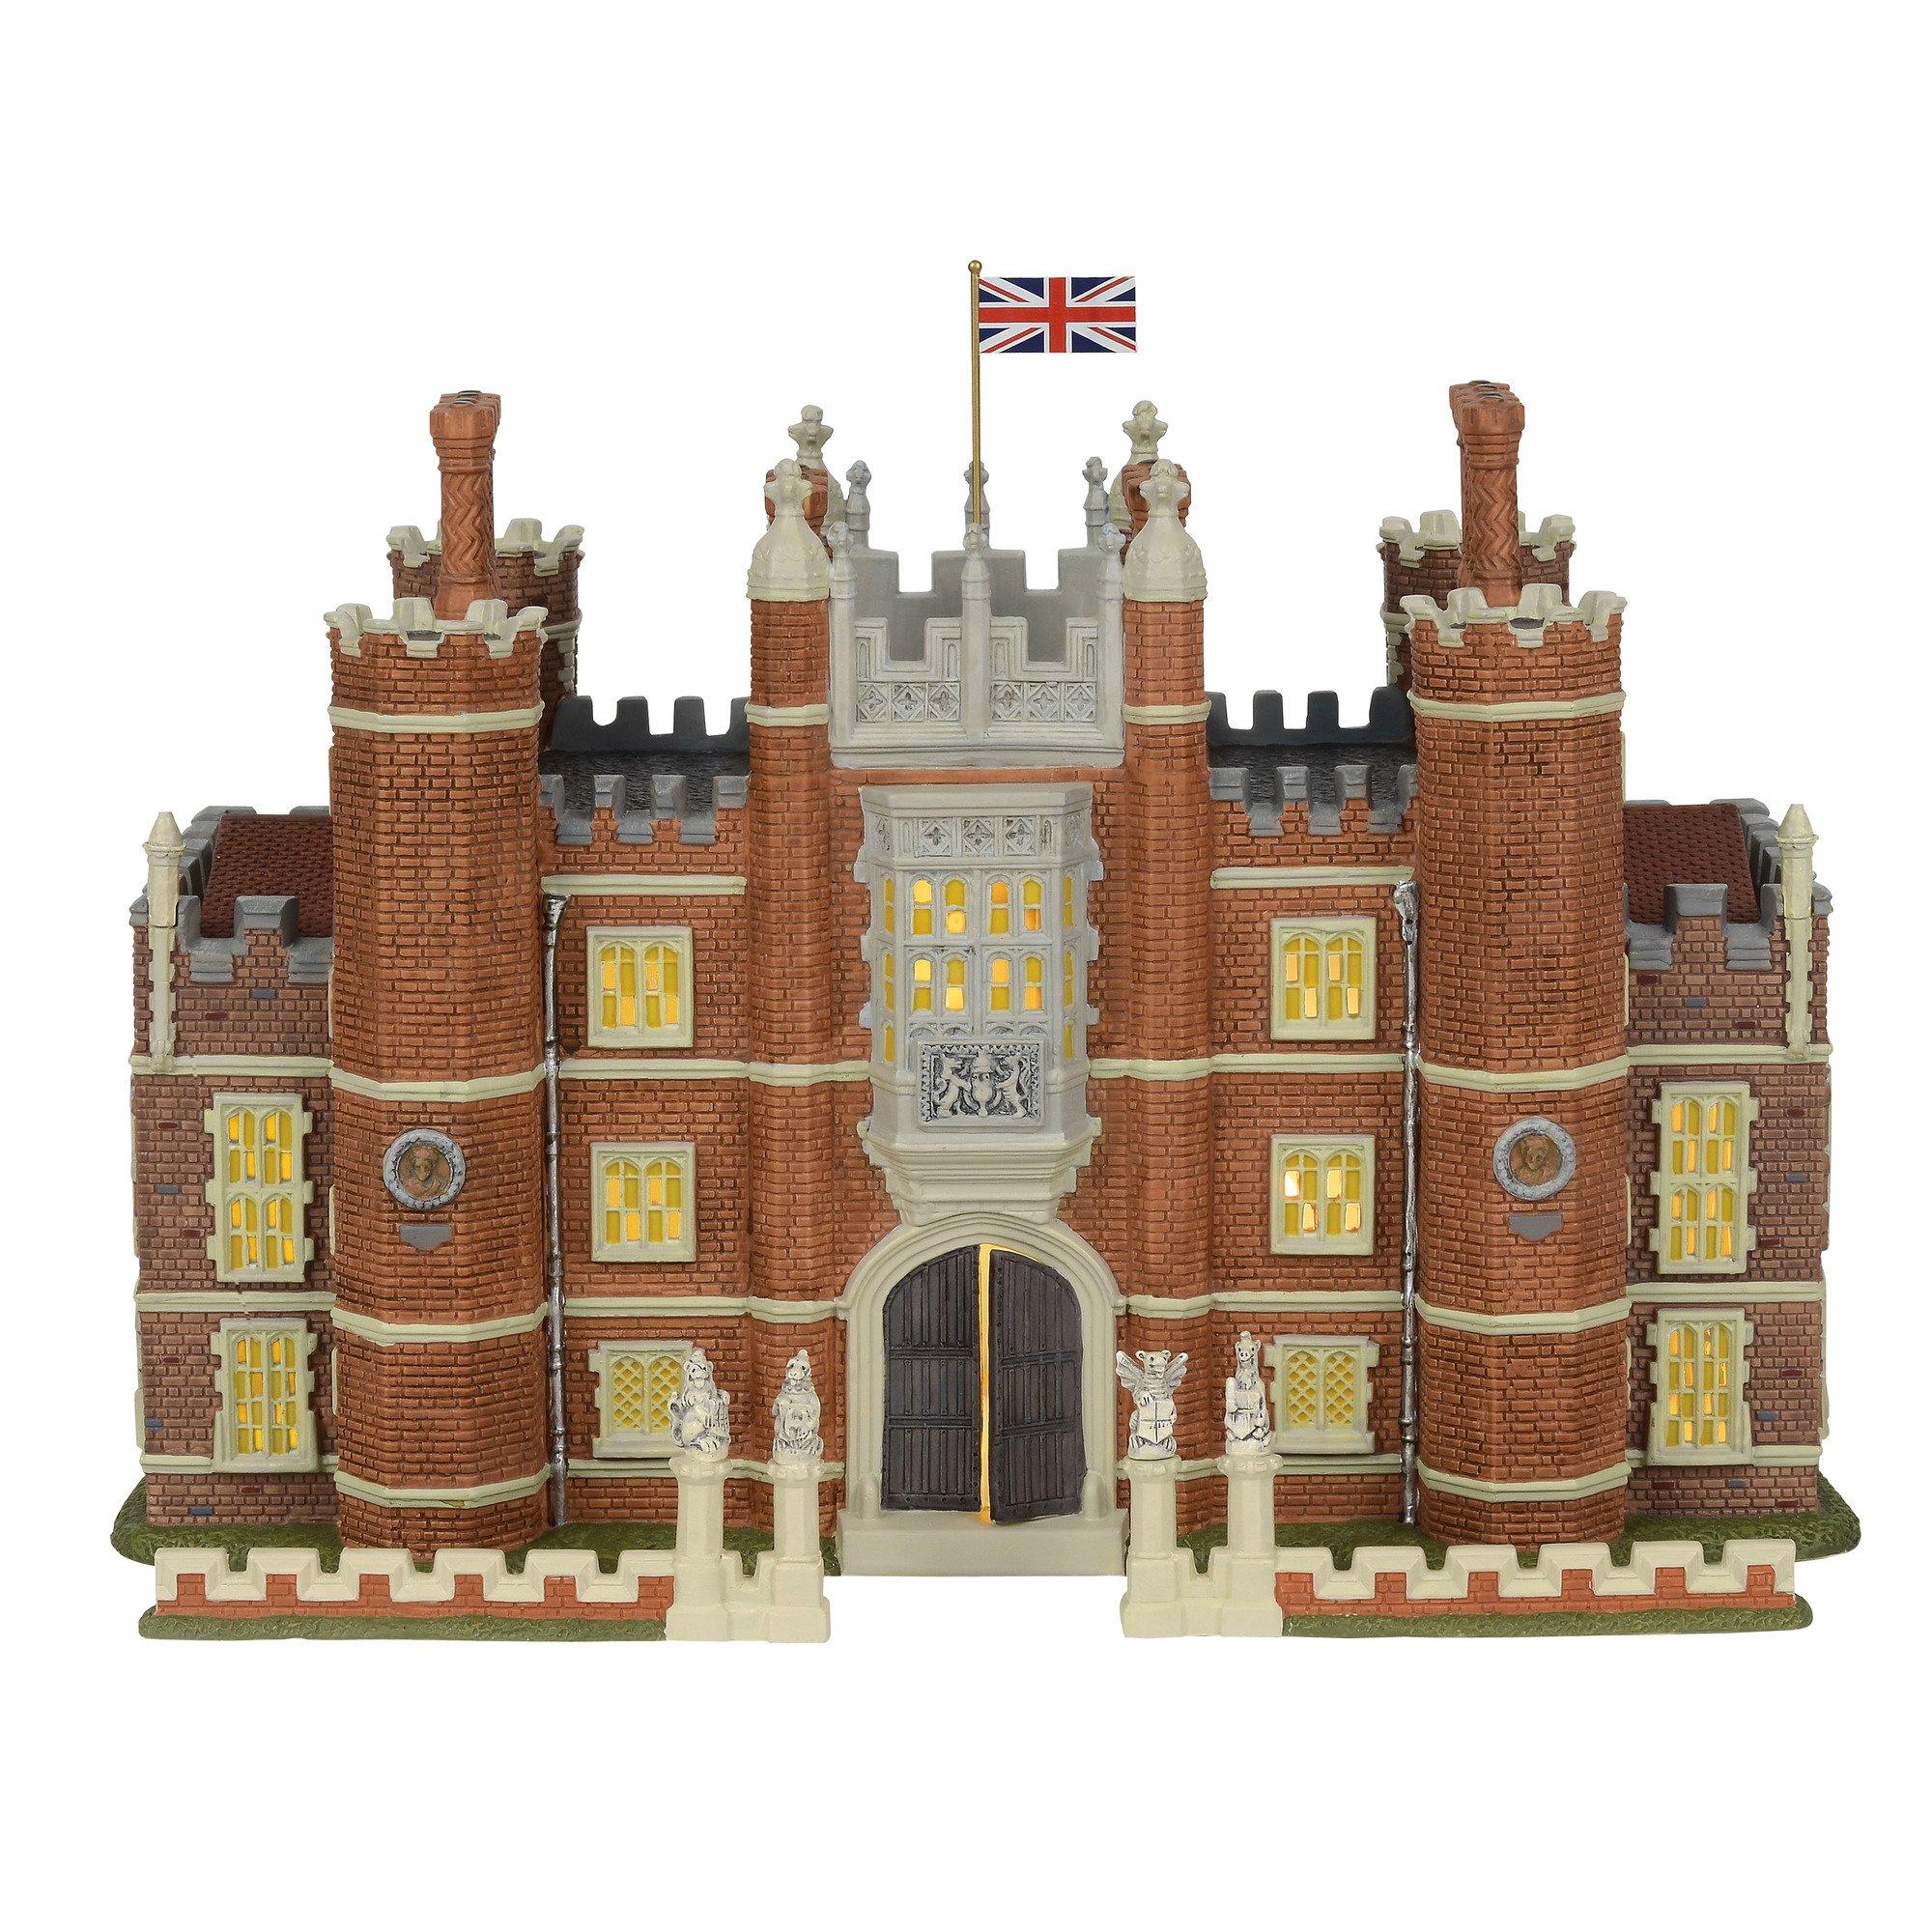 Department 56 Dickens Village Hampton Court Palace Lit Building and Accessories, 8.75'', Multicolor